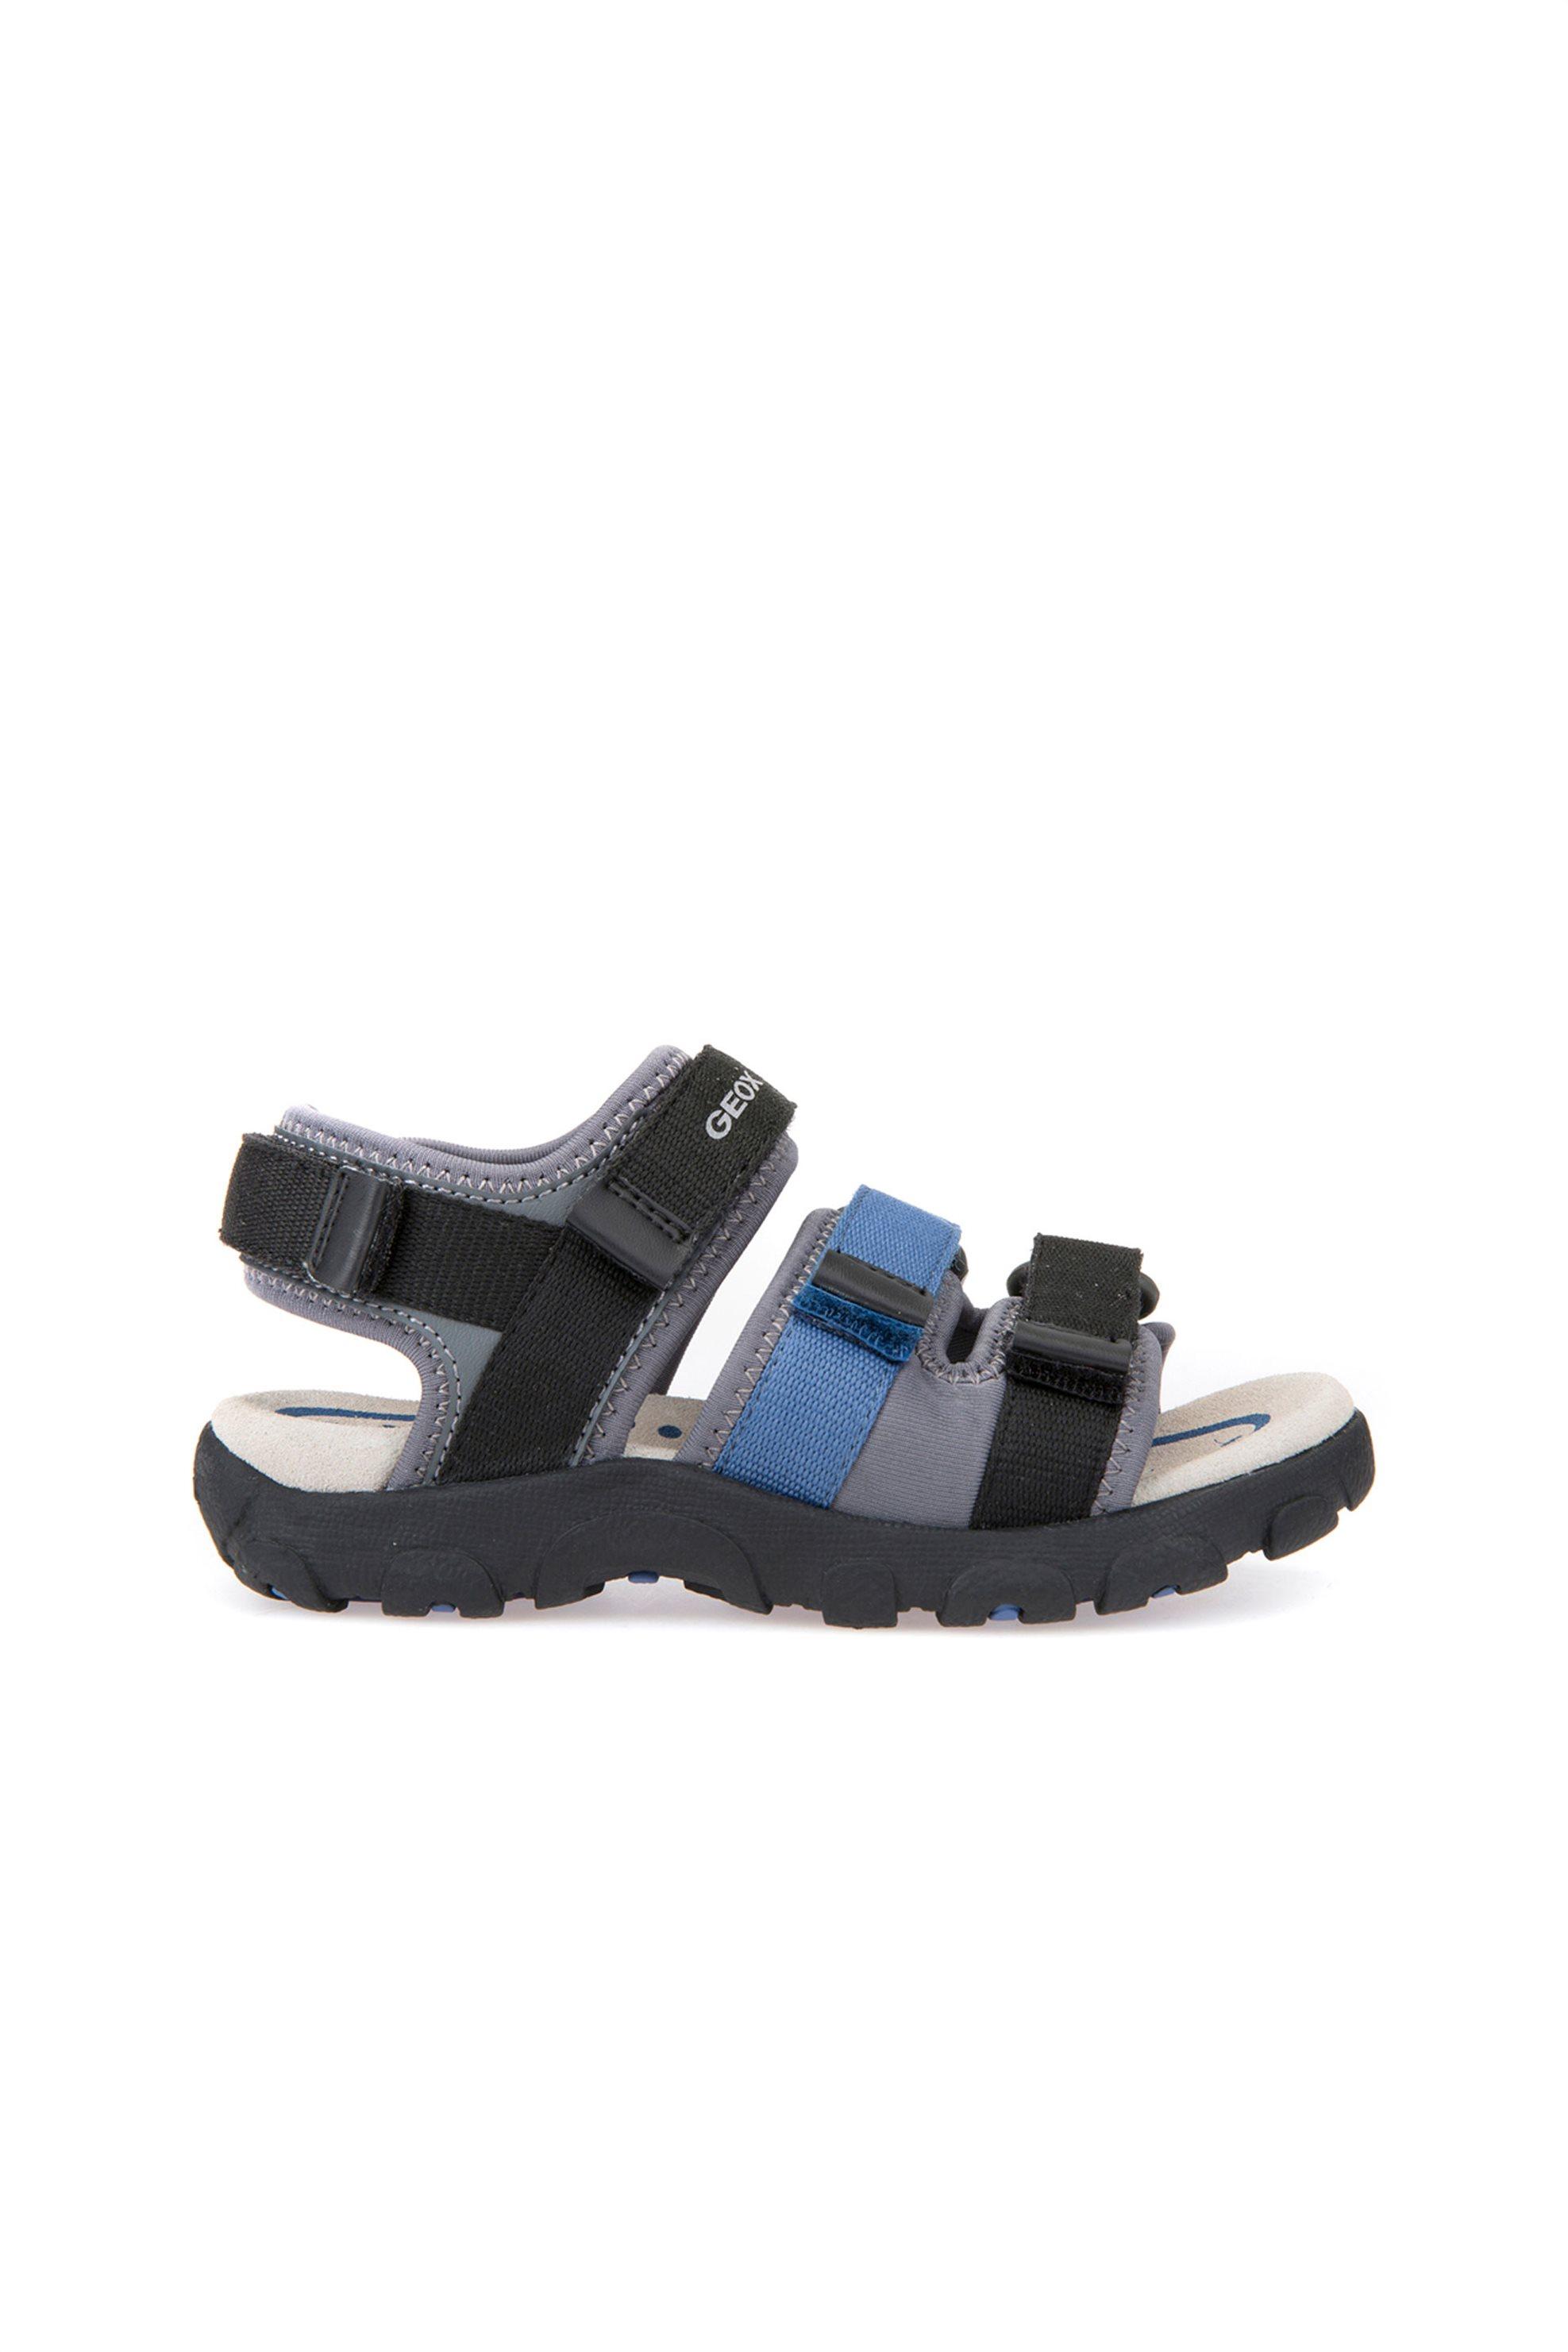 721ff021d4 -30% Notos Βρεφικά σανδάλια Jr Sandal Strada Geox – J8224A – Μπλε Σκούρο